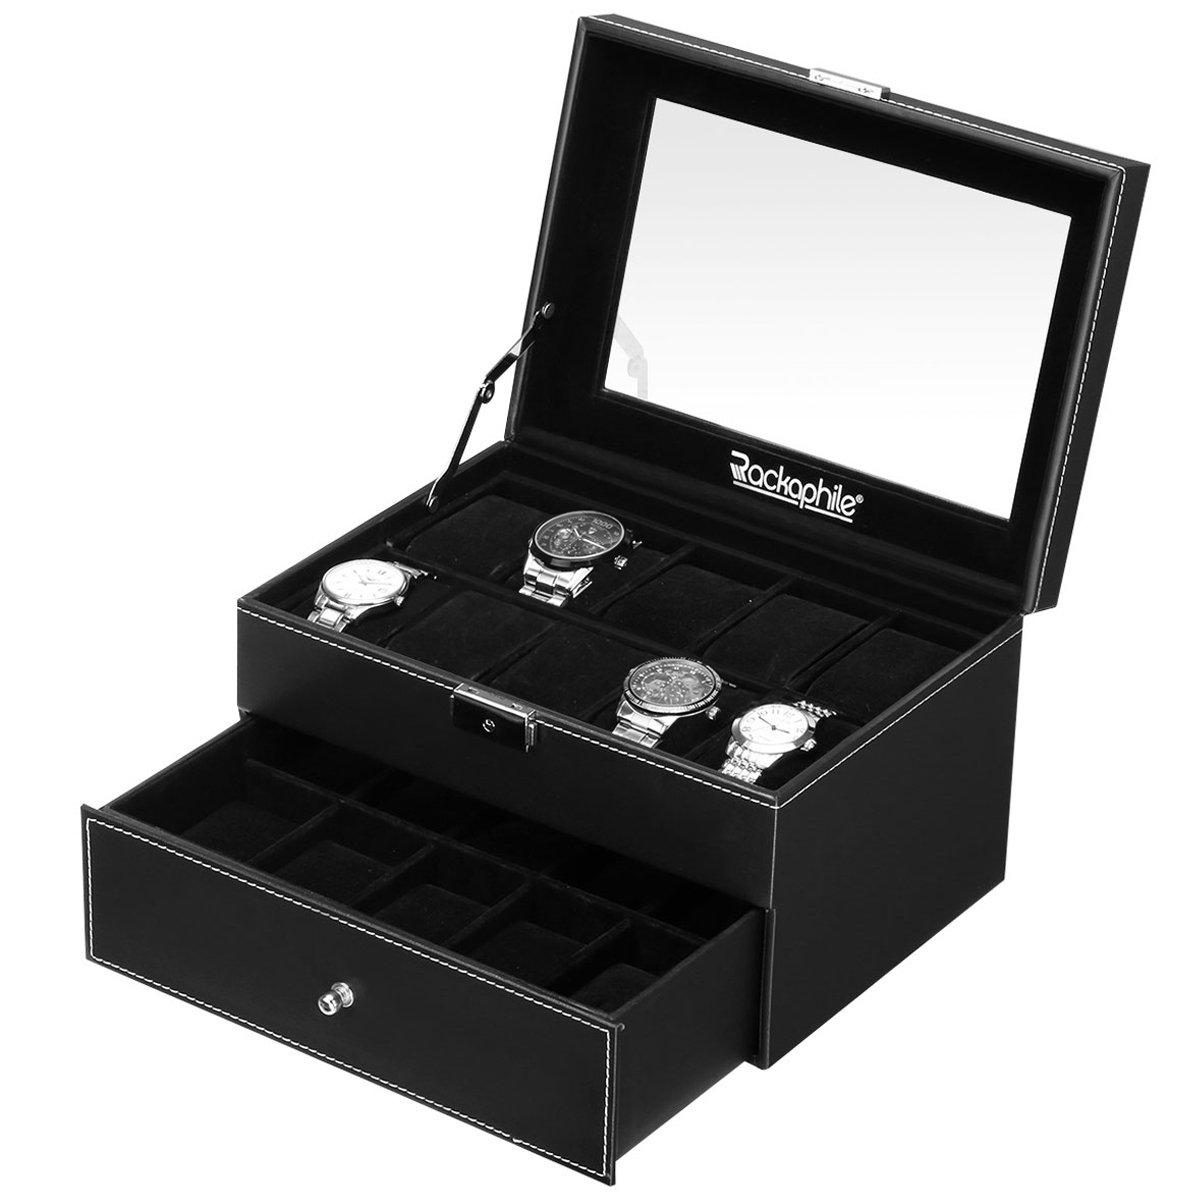 Rackaphile Watch Storage Box, 20 Slot Watch Display Case Leather Lockable Watch Organizer Box Jewelry Box Drawer Real Glass Men Women, Black